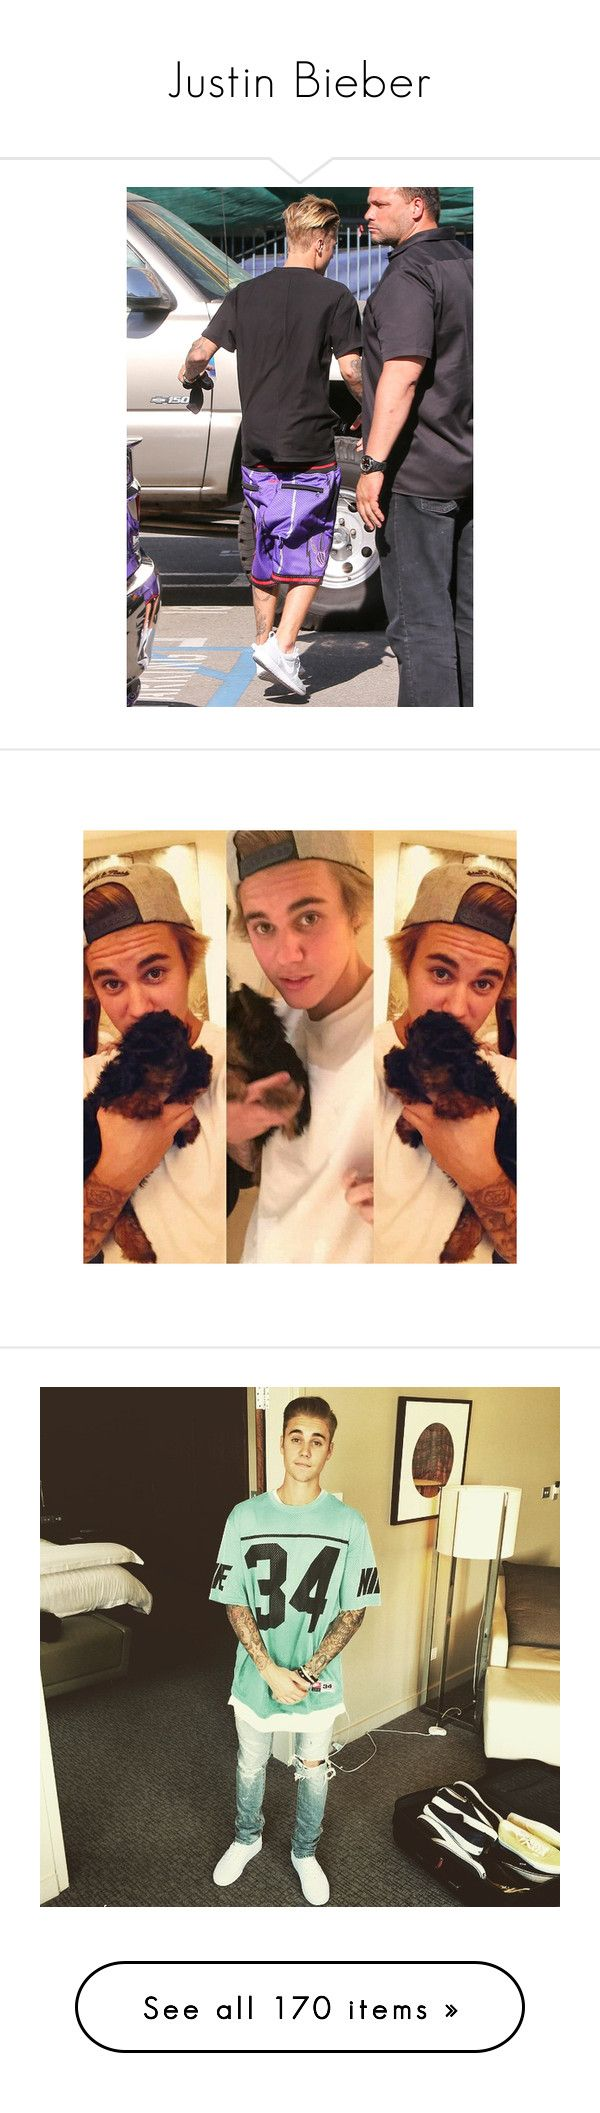 """Justin Bieber"" by carolnegherbon ❤ liked on Polyvore featuring home, home decor, justin bieber, justin, jb, instagram, ariana grande, magazine, accessories and calvin klein"